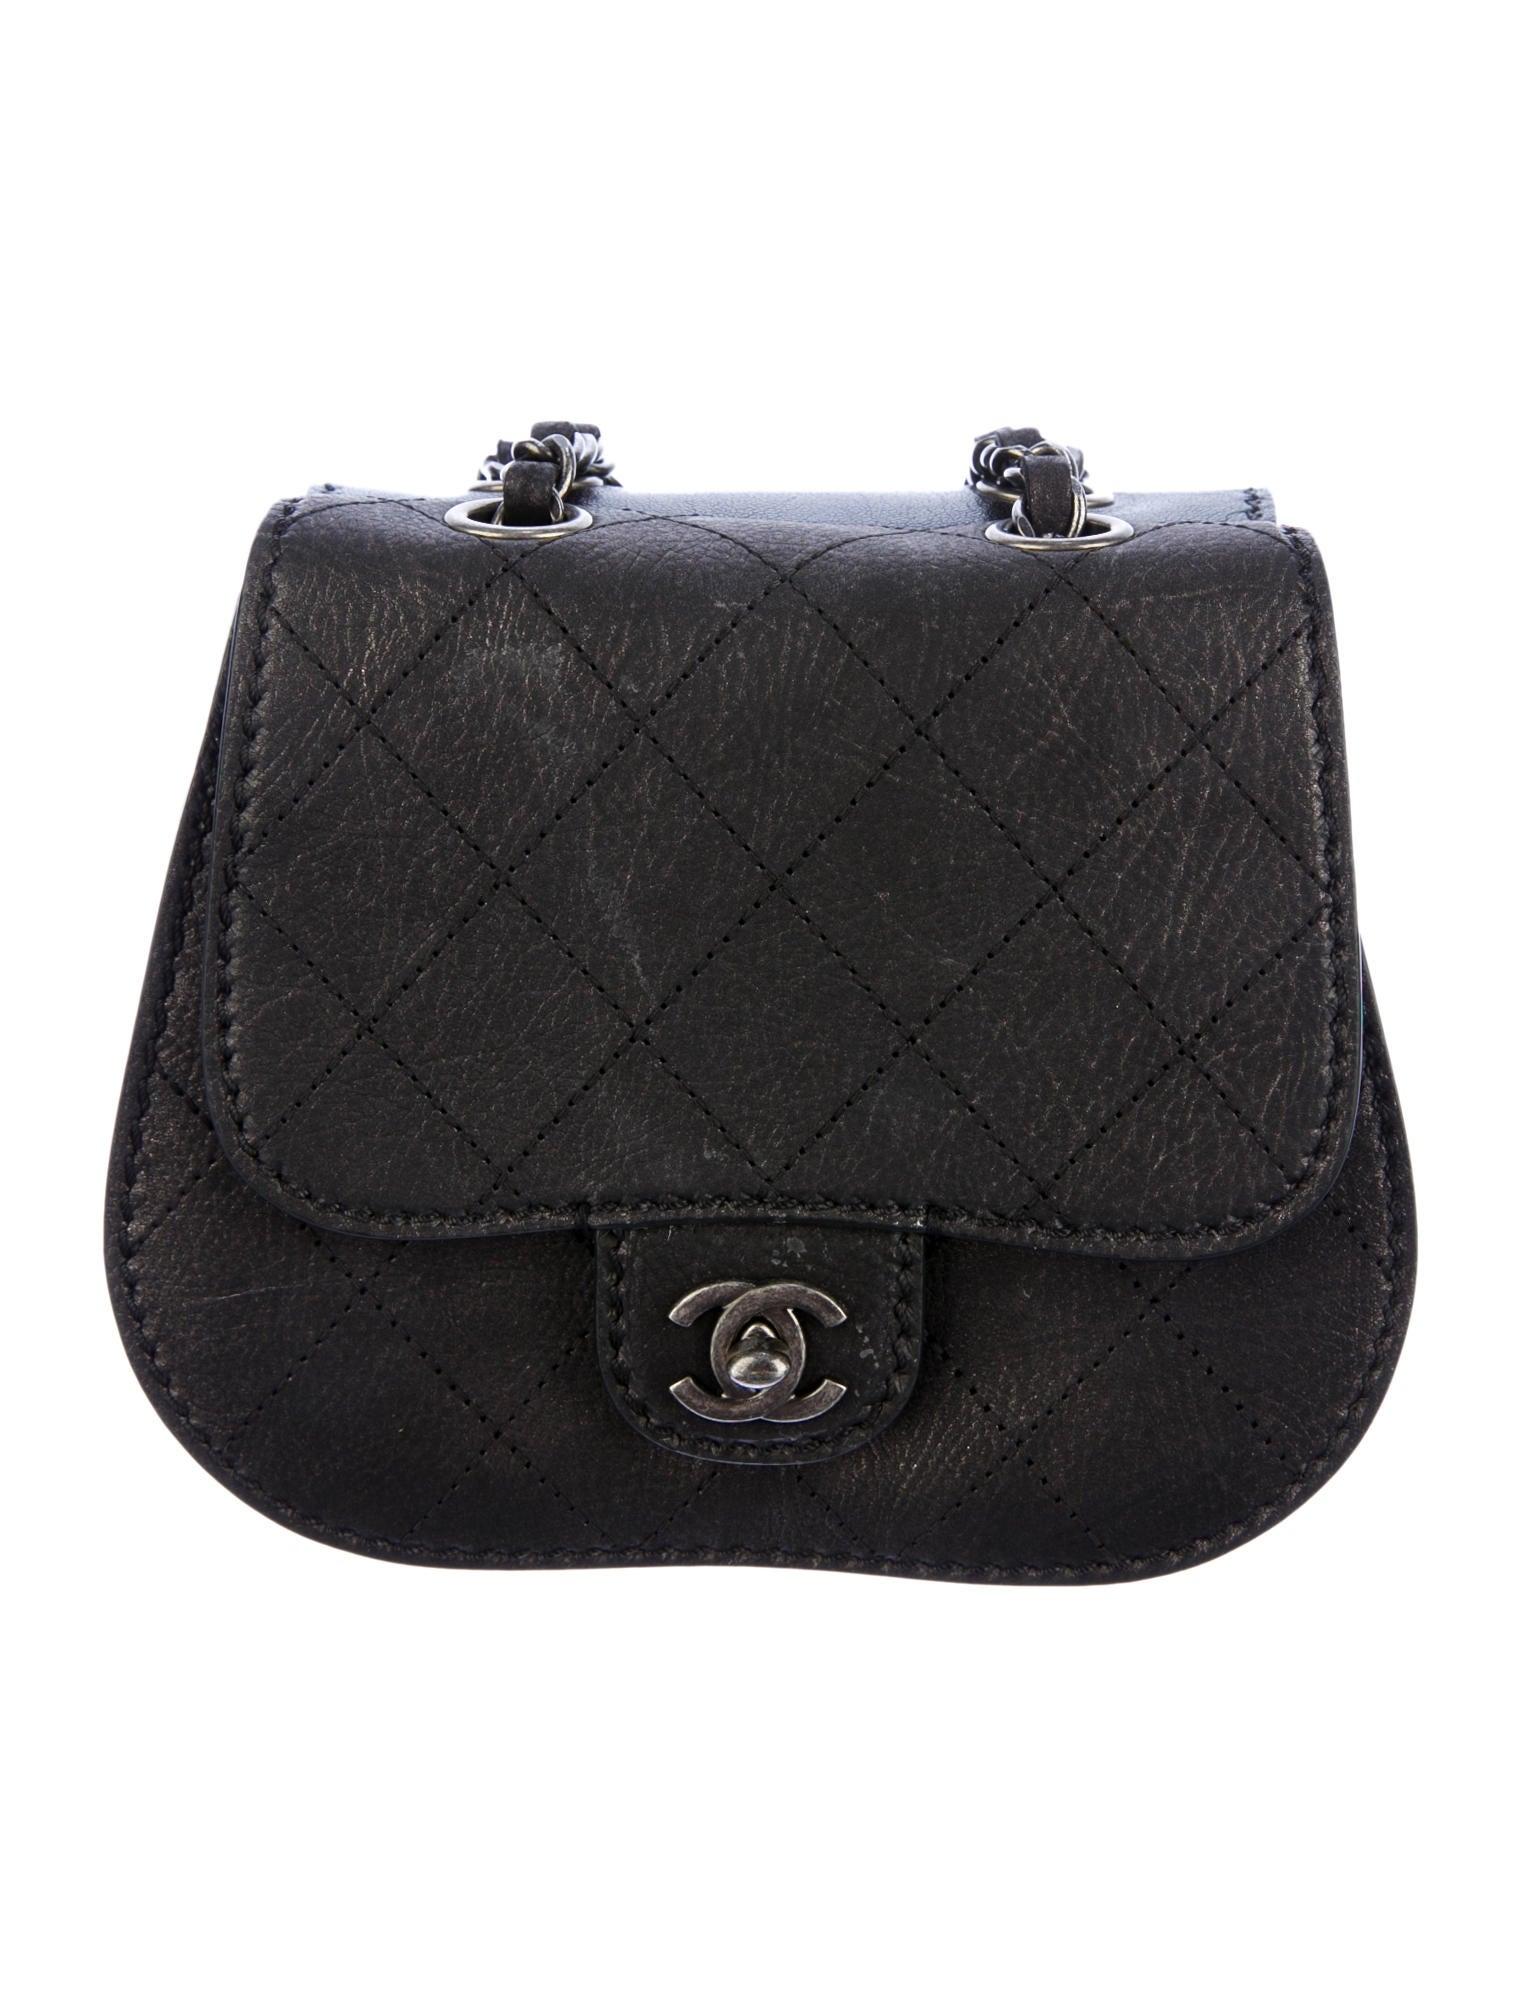 a44c746ecfe8 Chanel Paris-Edinburgh Flap Bag - Handbags - CHA52576